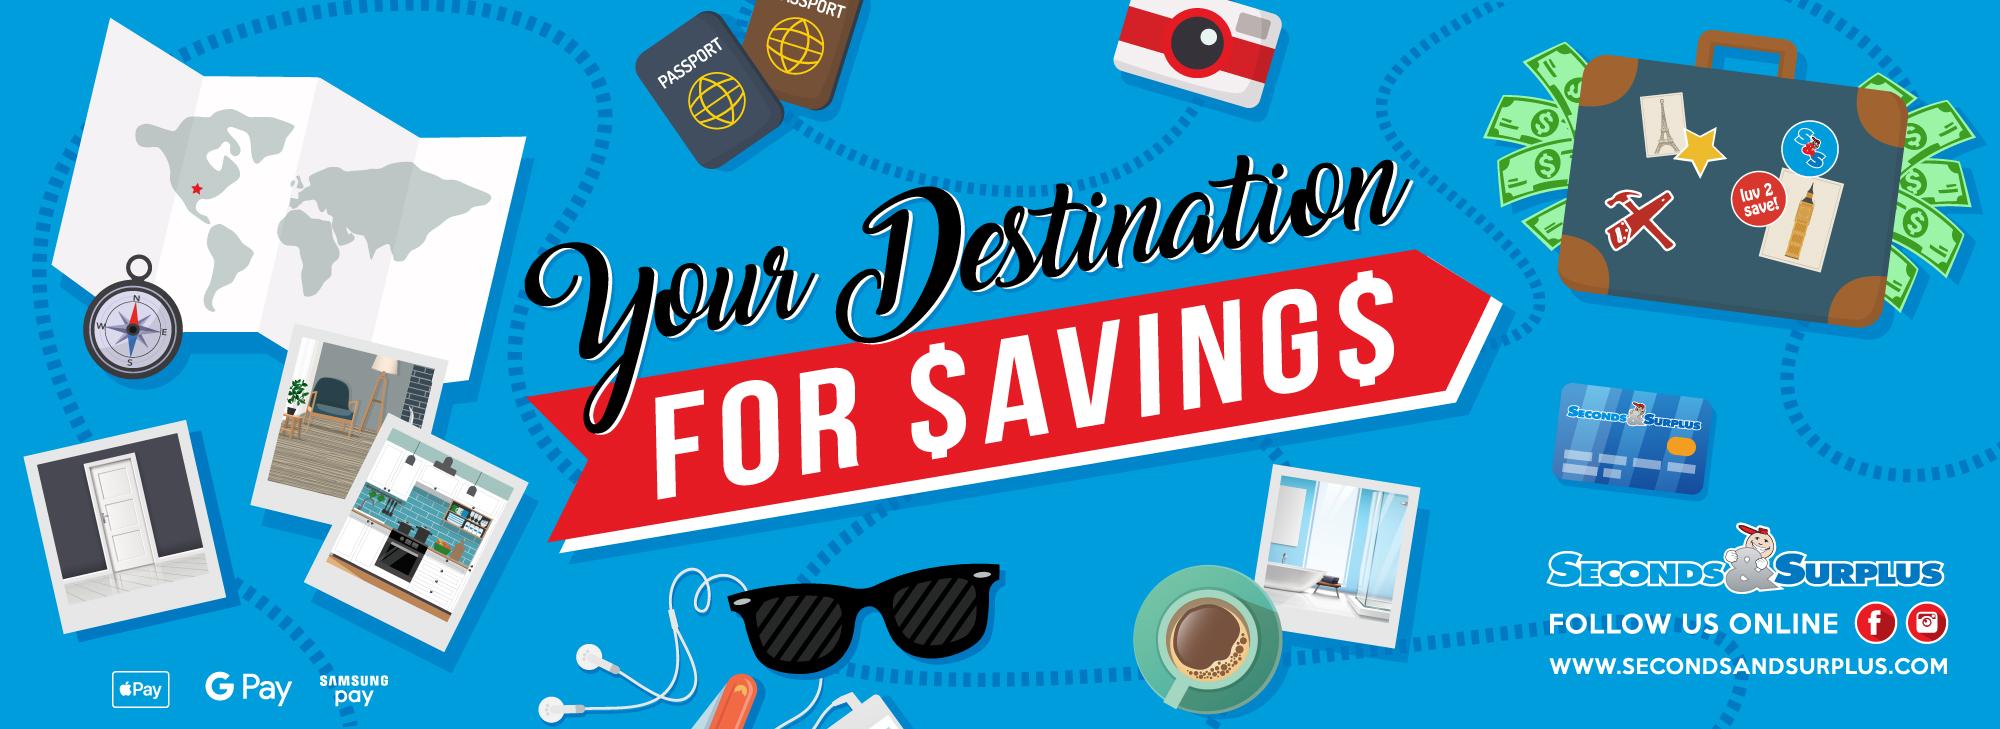 Your Destination for Savings!